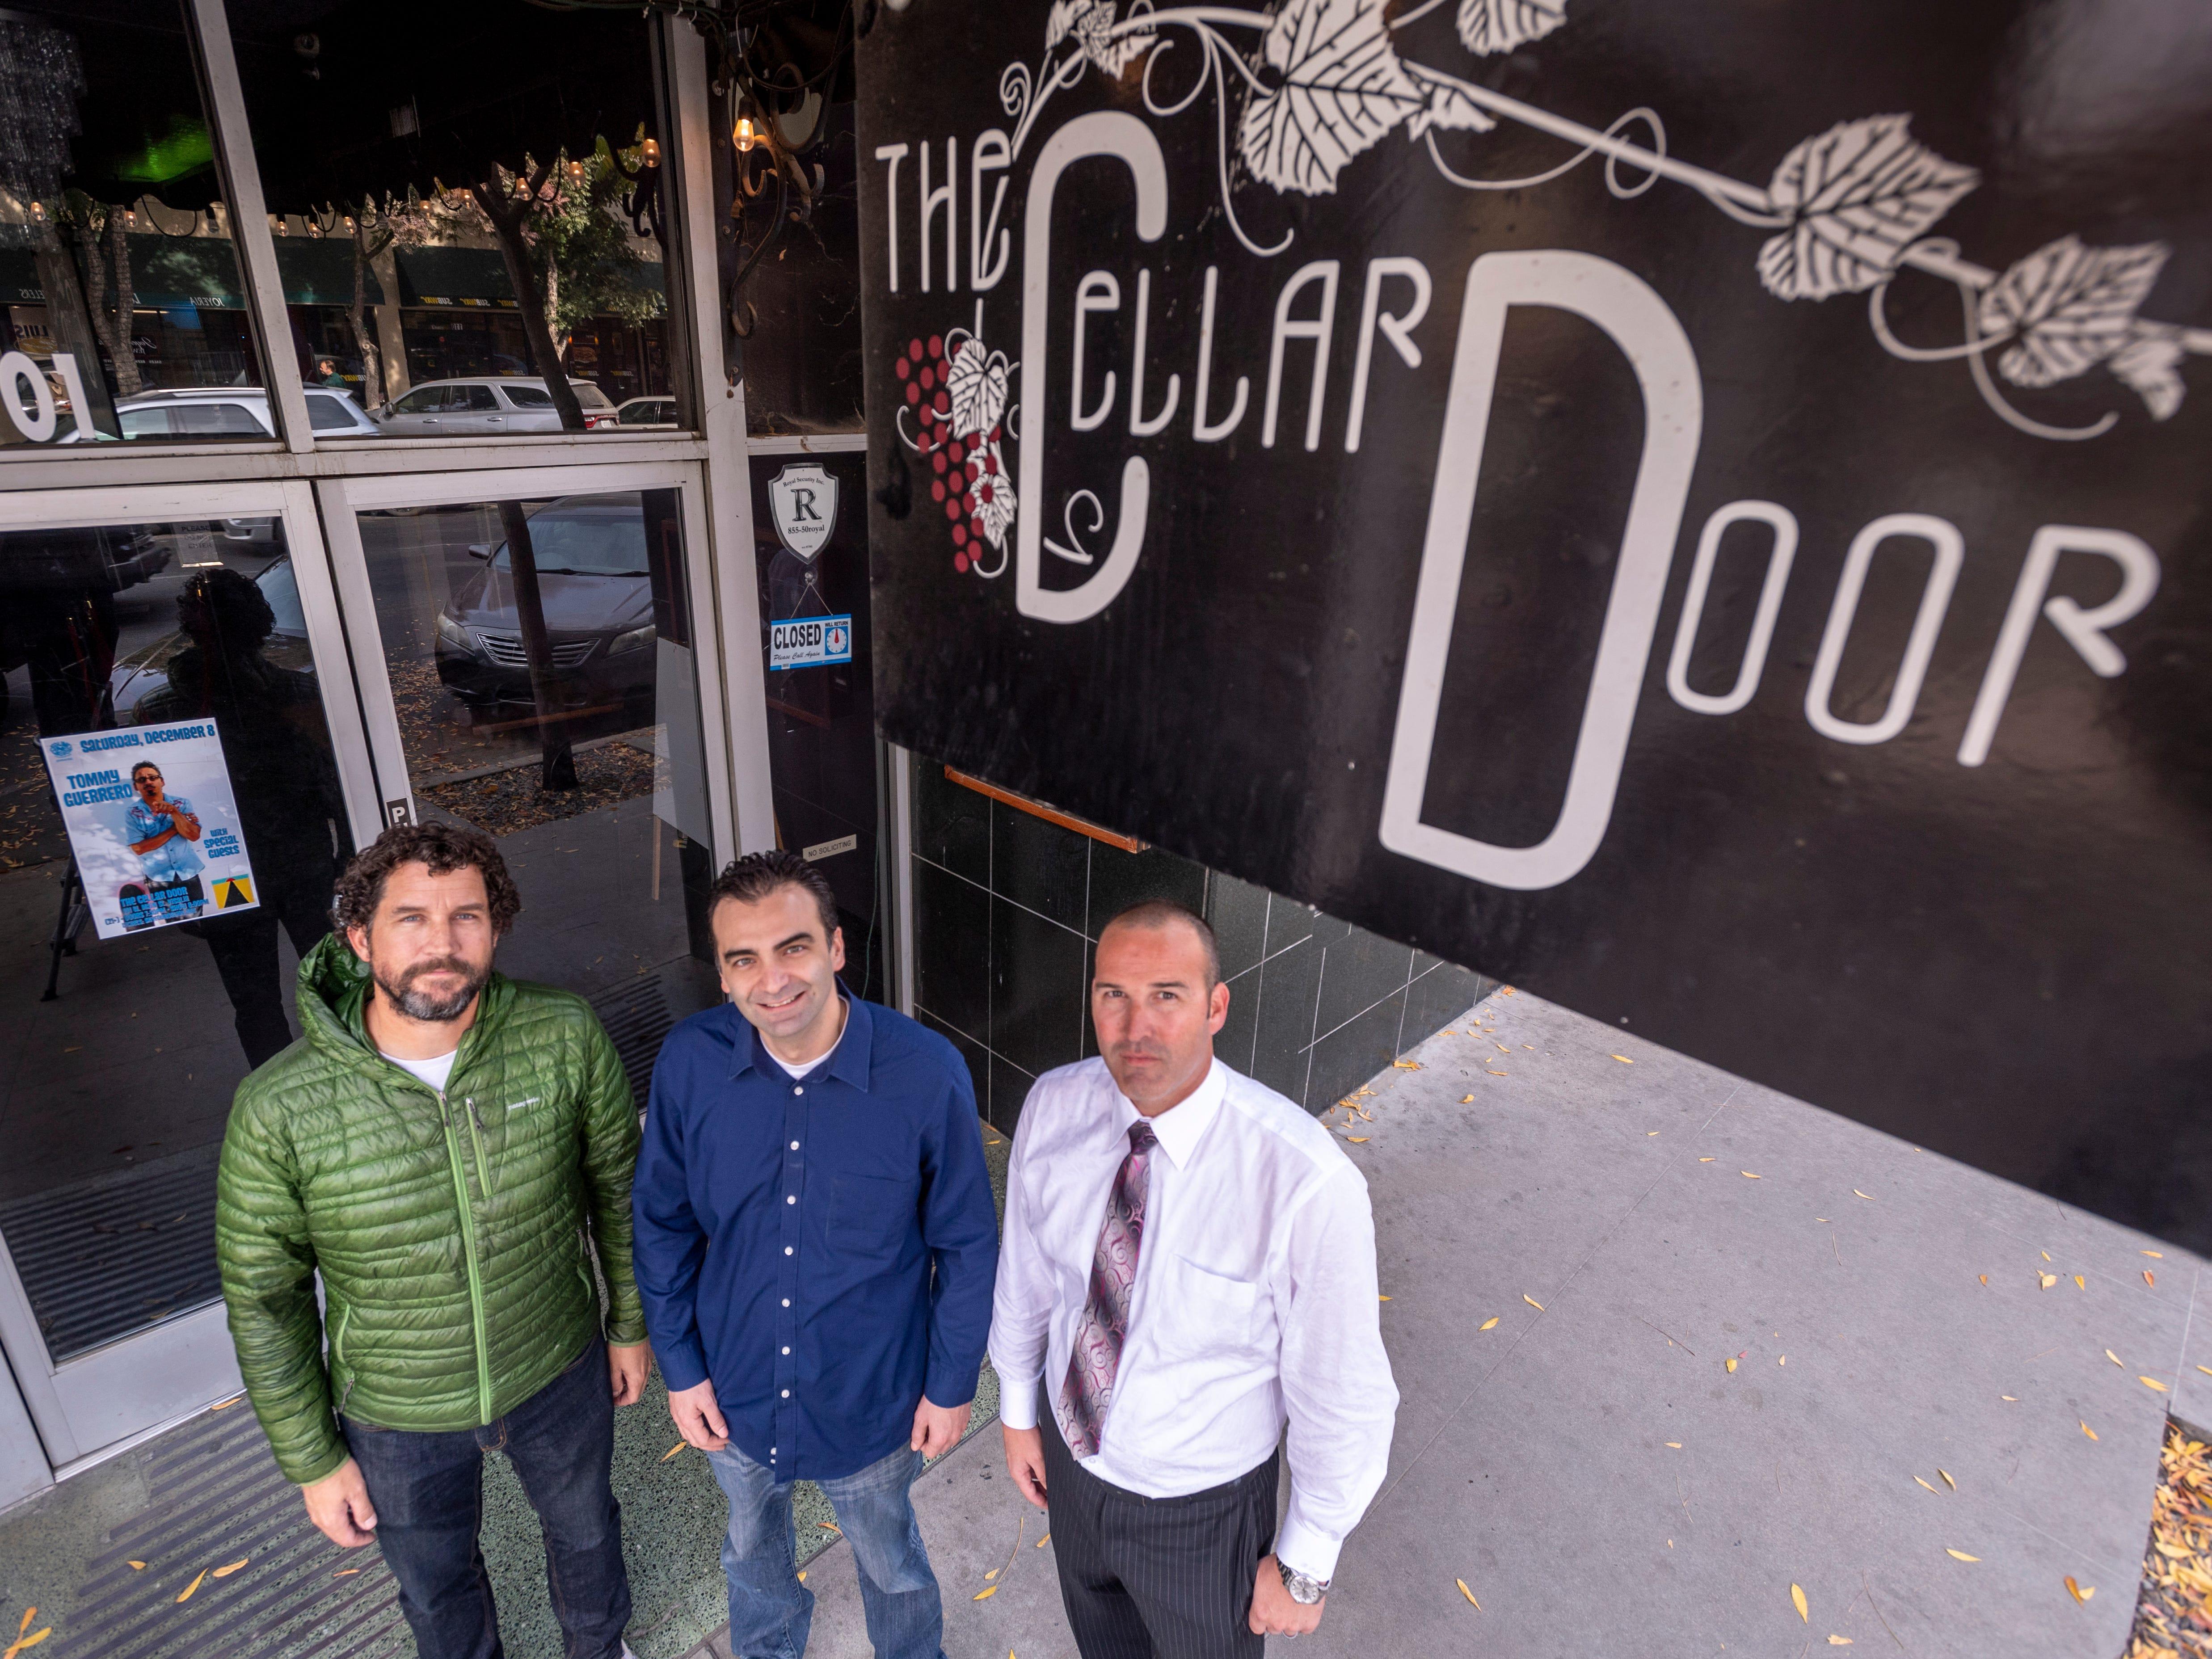 Marc Dwelle, left, Tate Darwin and Ryan Sullivan plan to reopen the Cellar Door in Downtown Visalia.